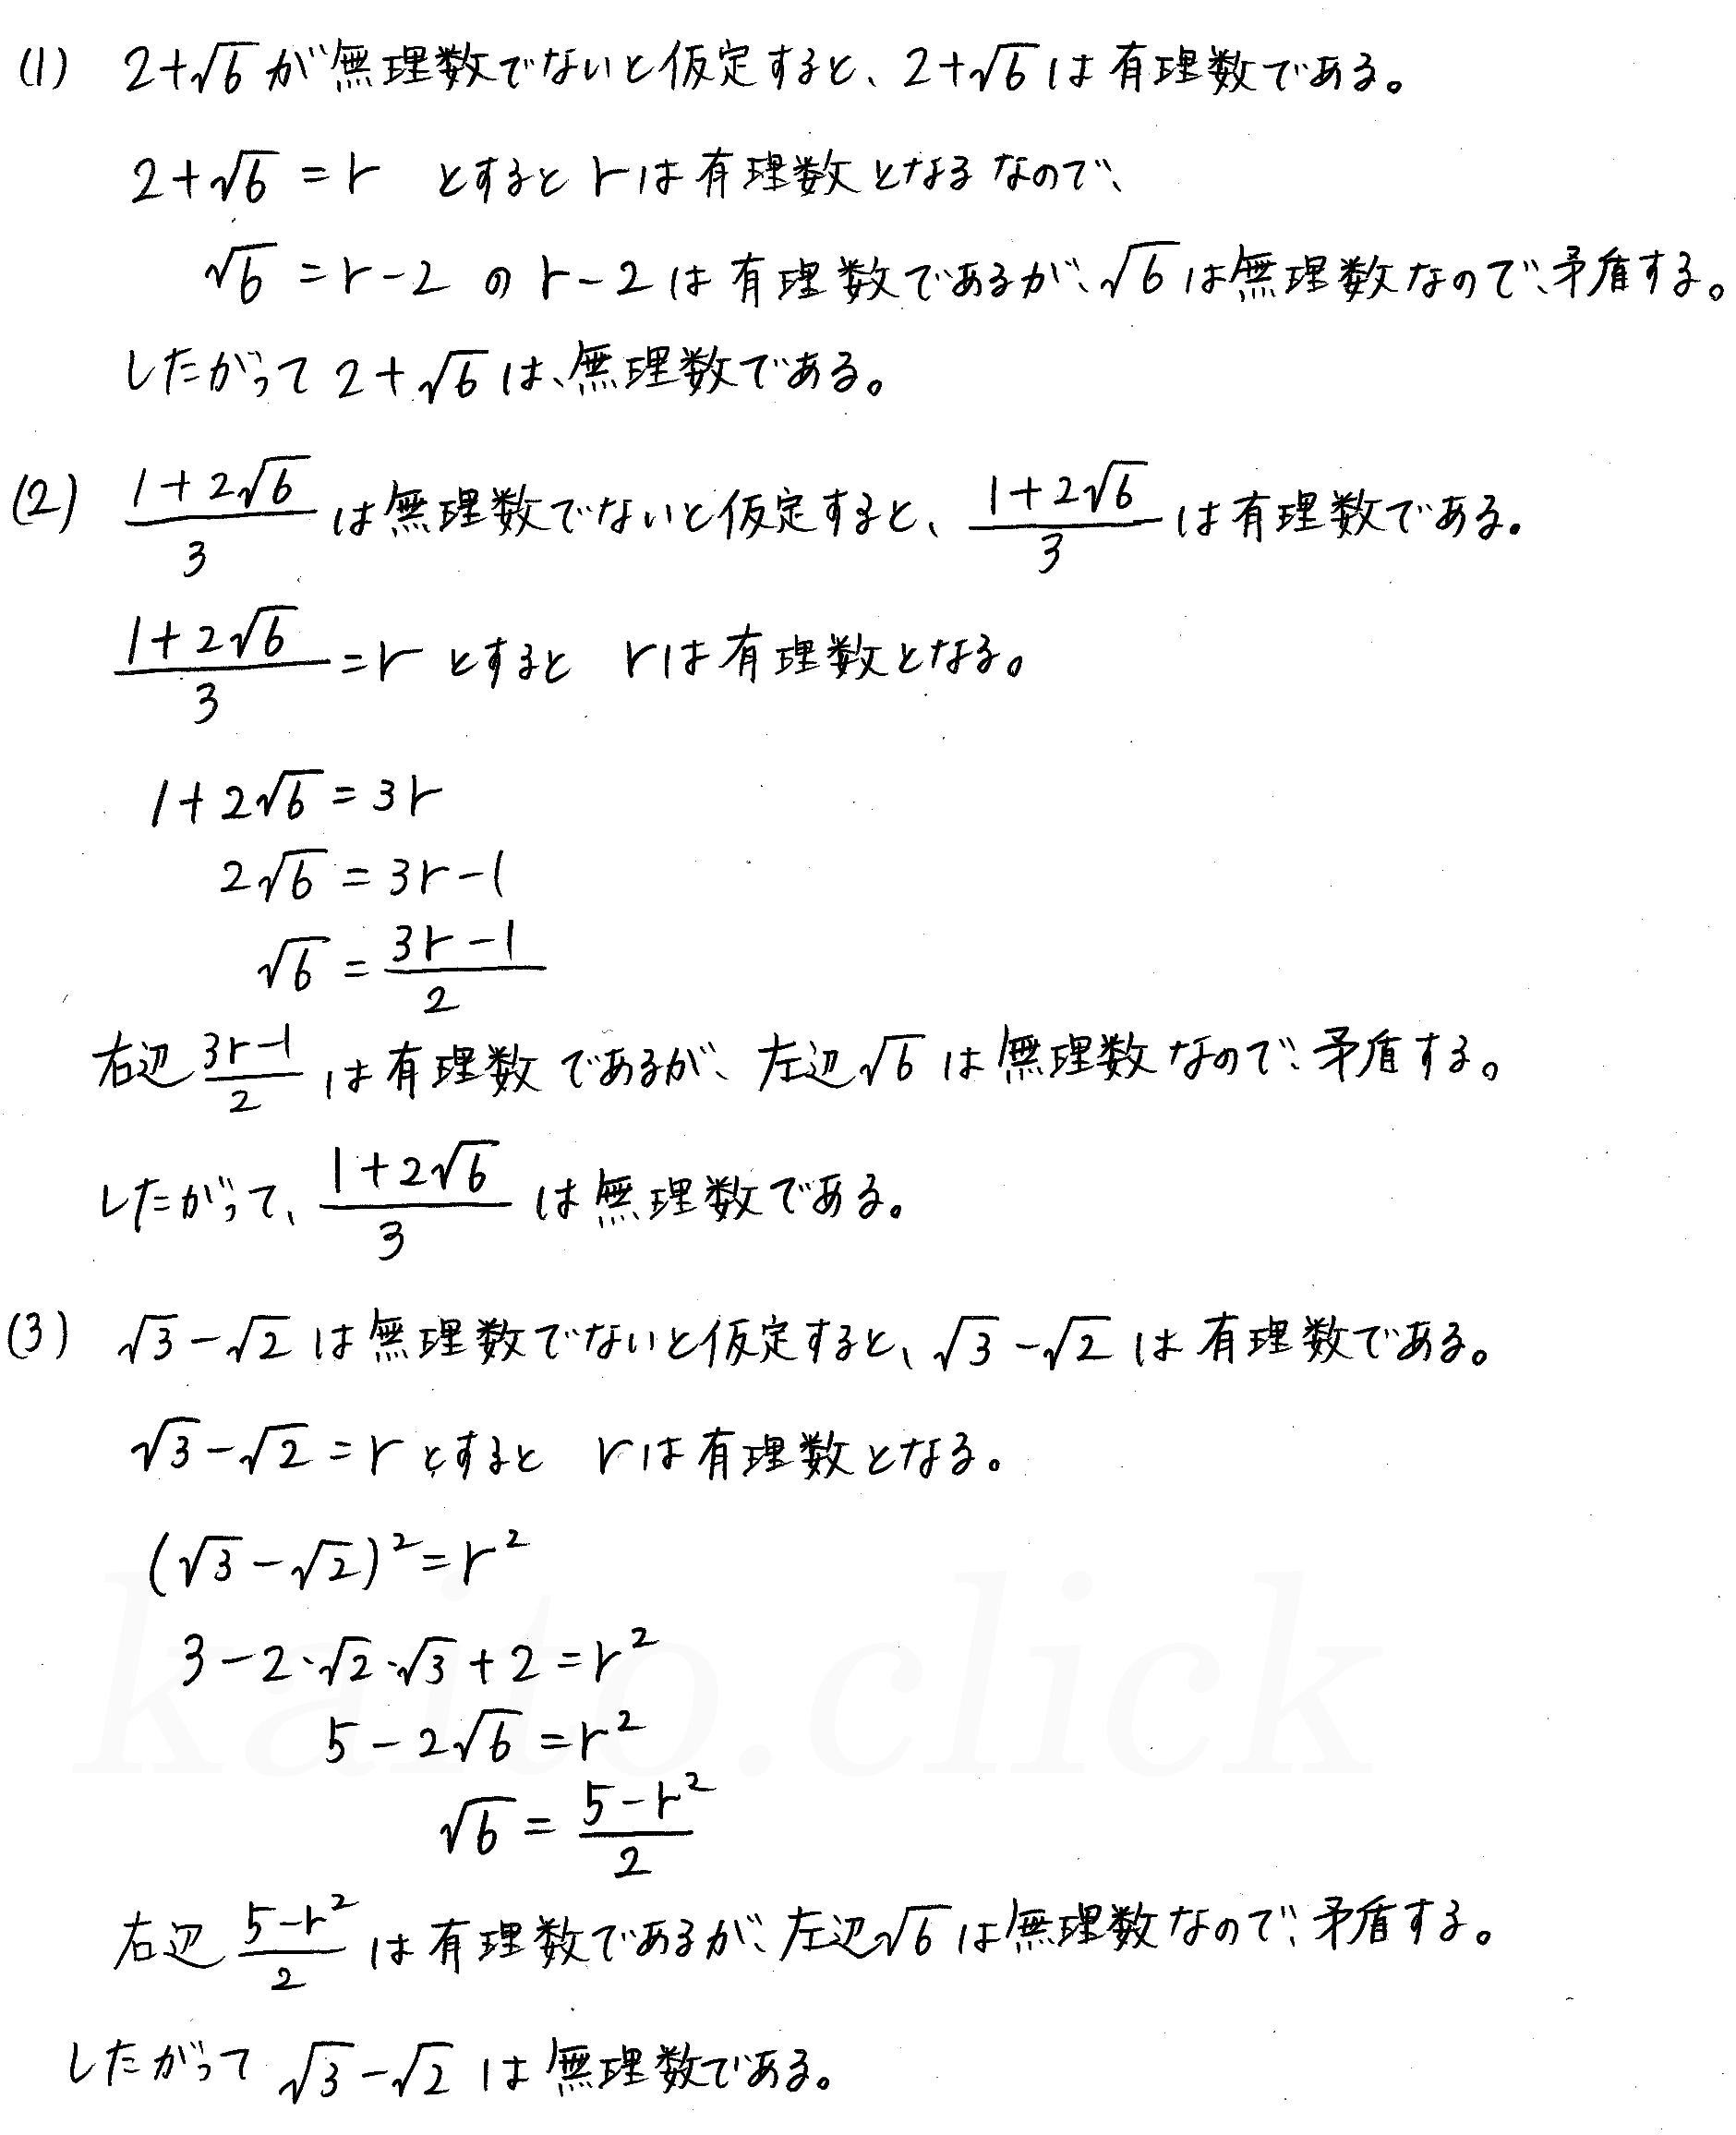 3TRIAL数学Ⅰ-107解答